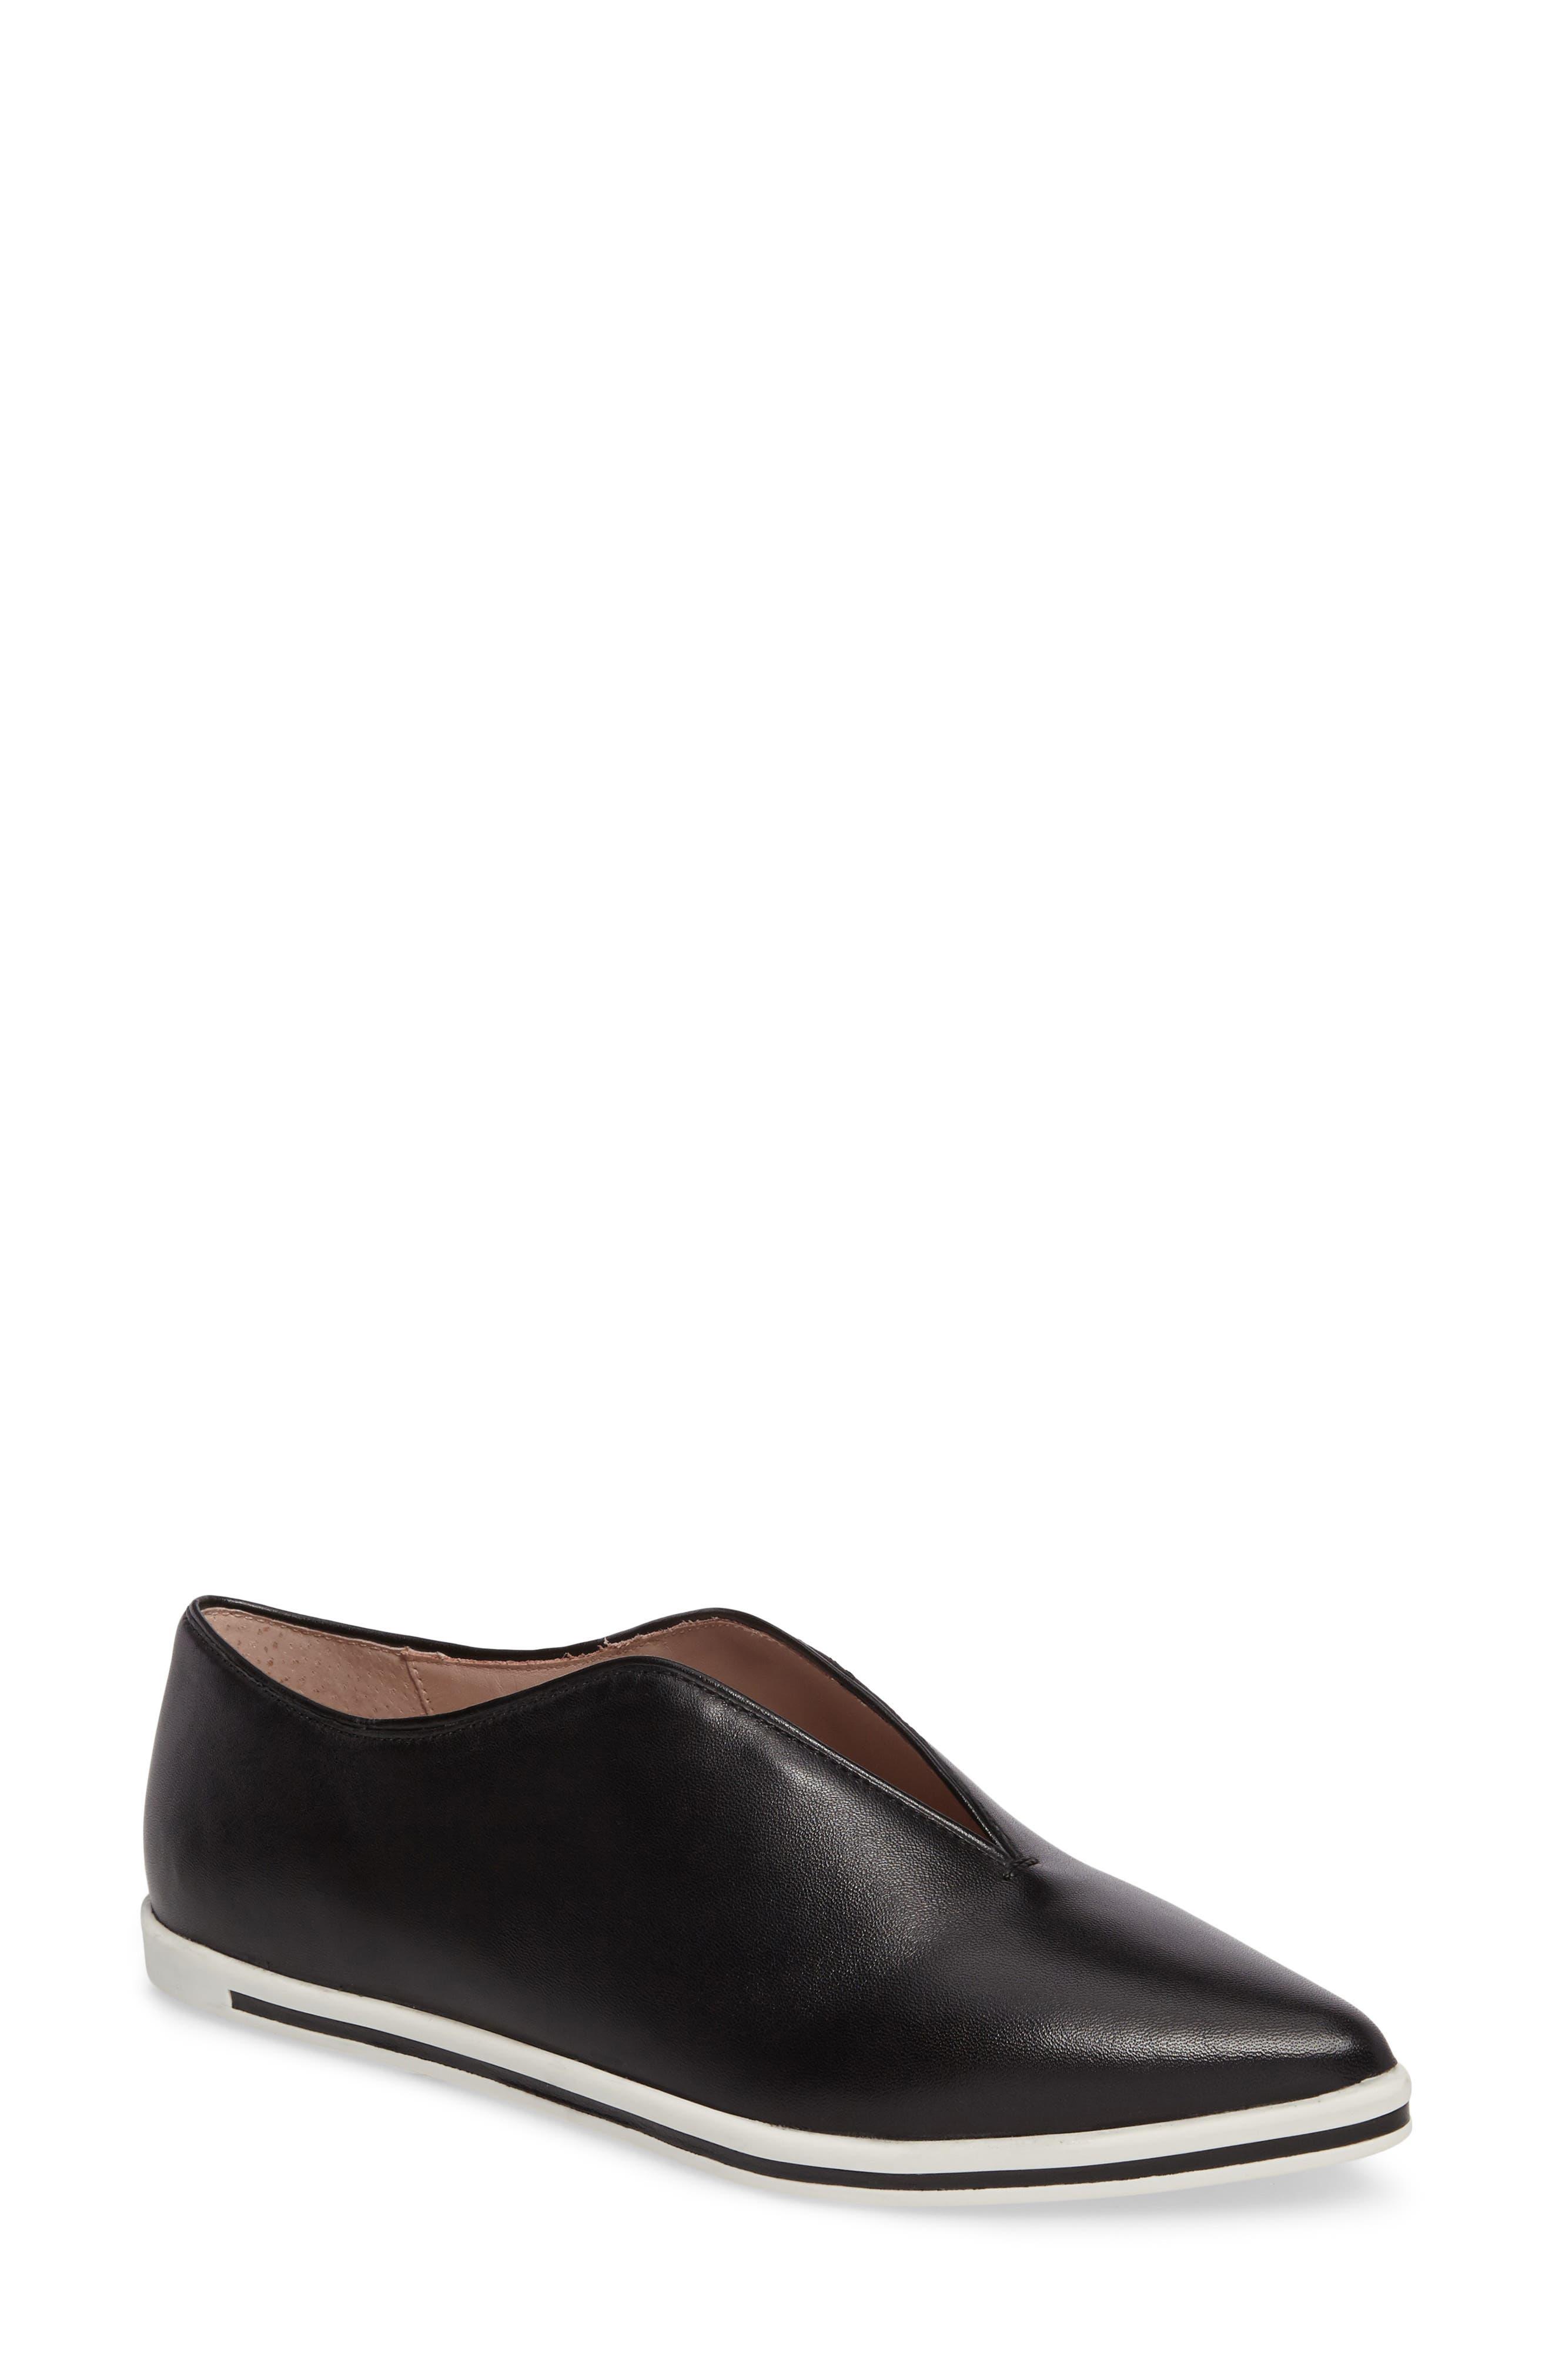 Tisha Slip-On Sneaker,                         Main,                         color, 004